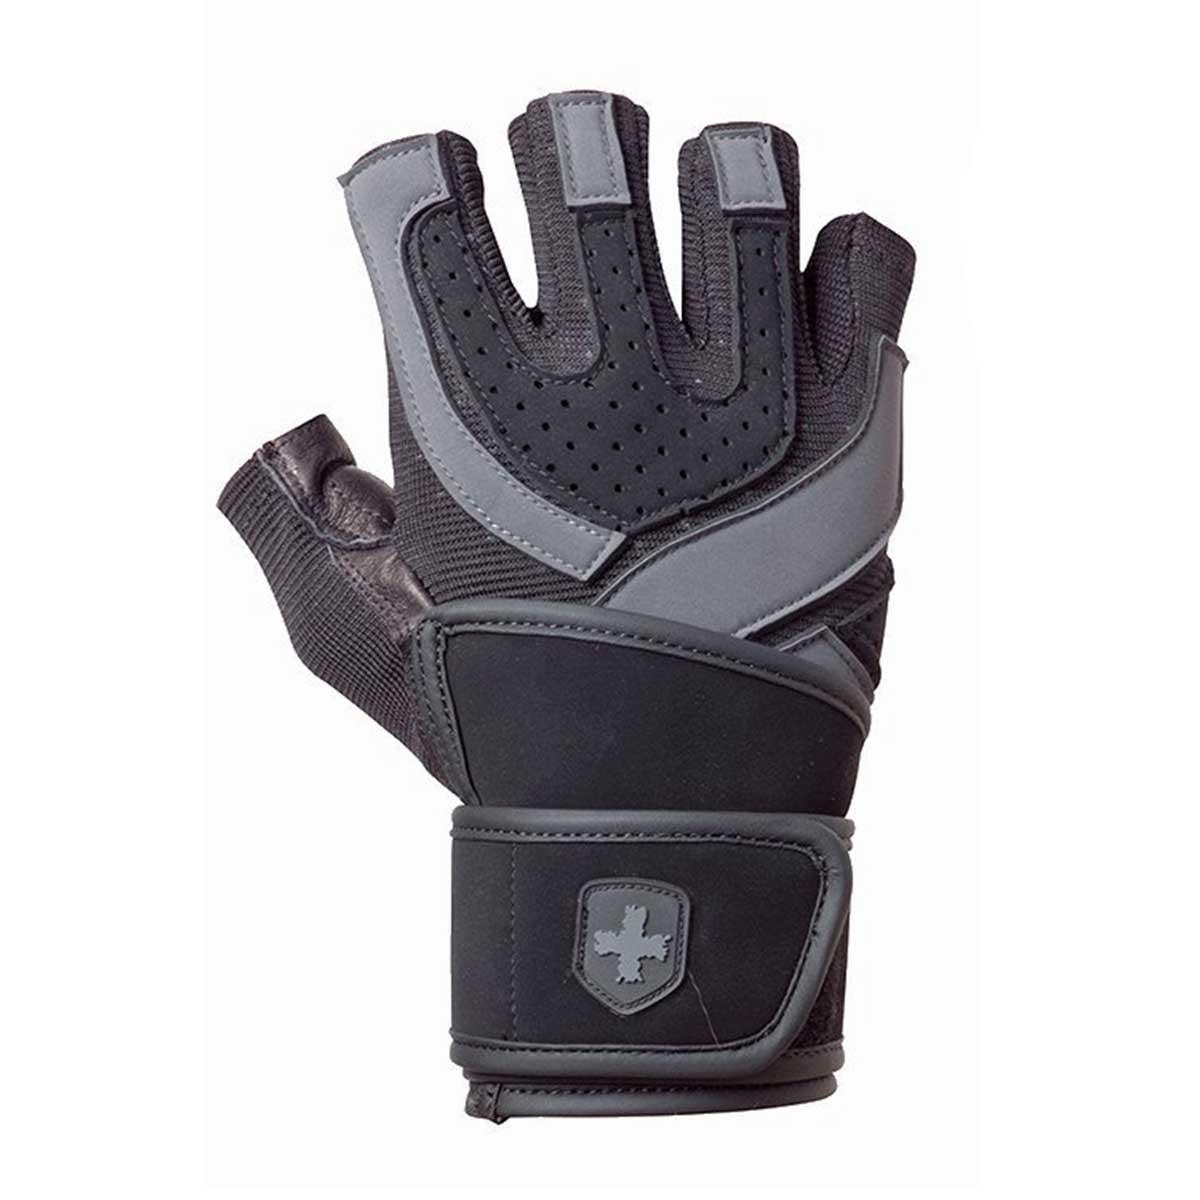 Harbinger Womens Wristwrap Gloves: Buy Harbinger Train Grip Gym Gloves Online India